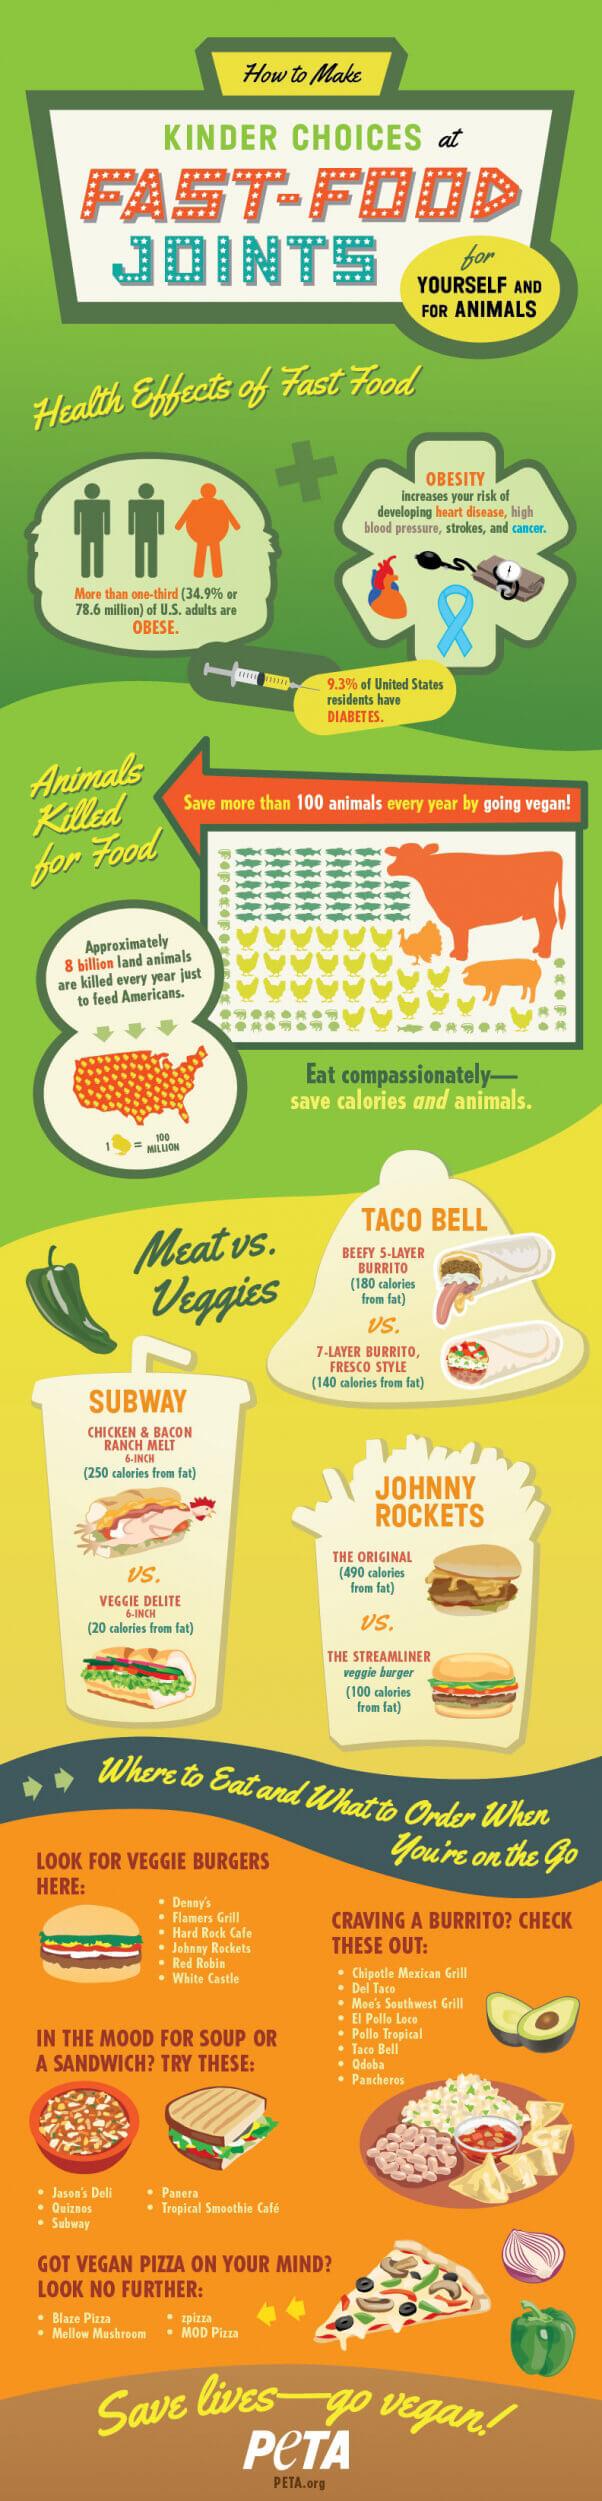 infographic-fastfood-kinderchoices-peta